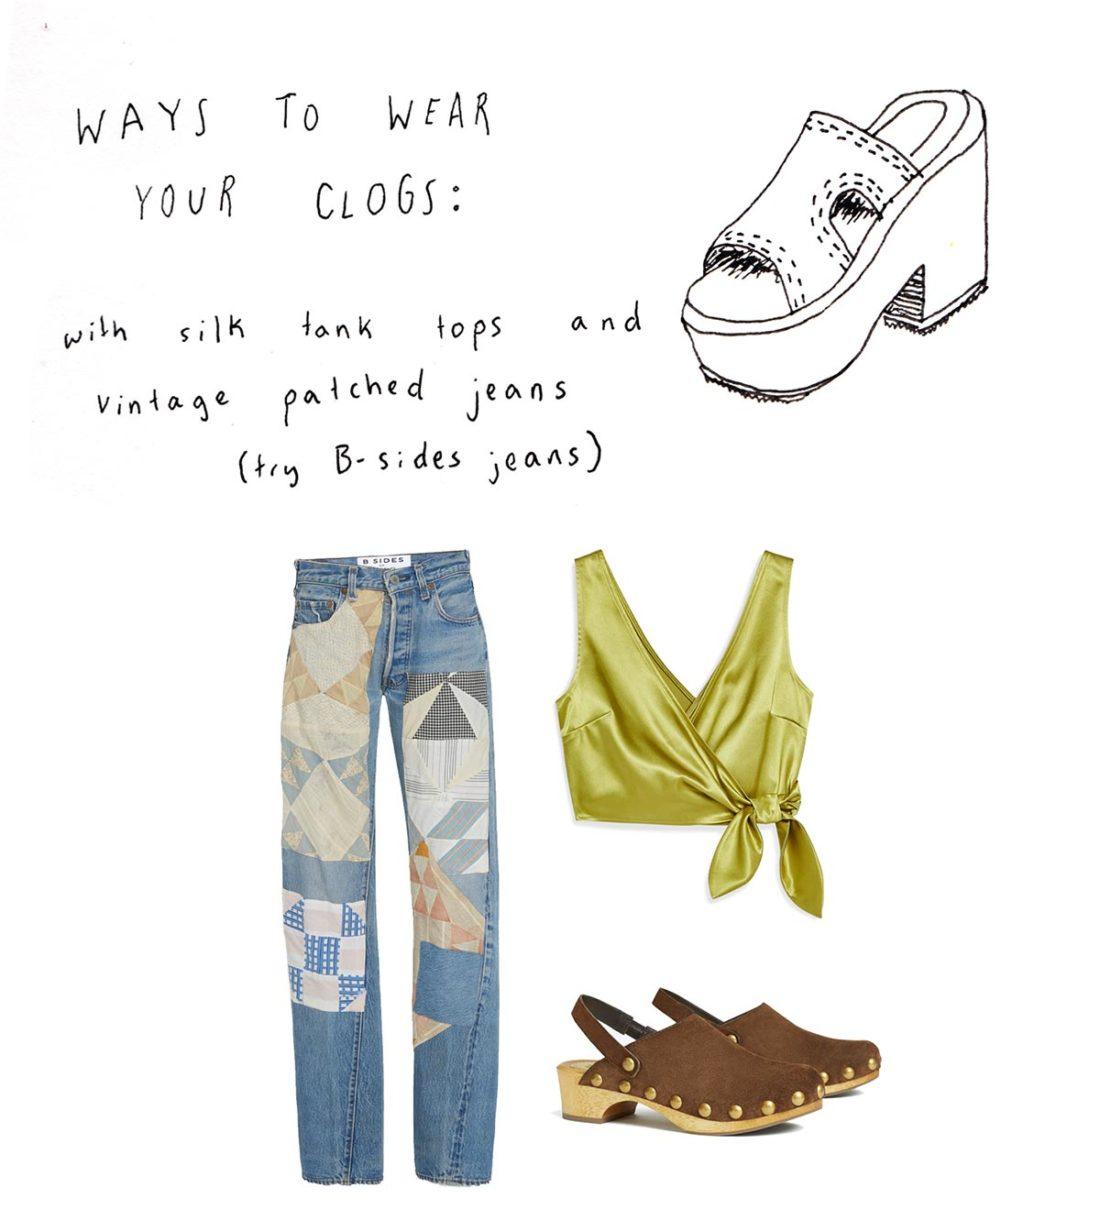 606549e7e50 Sea of Shoes - The Official Home of Jane Aldridge